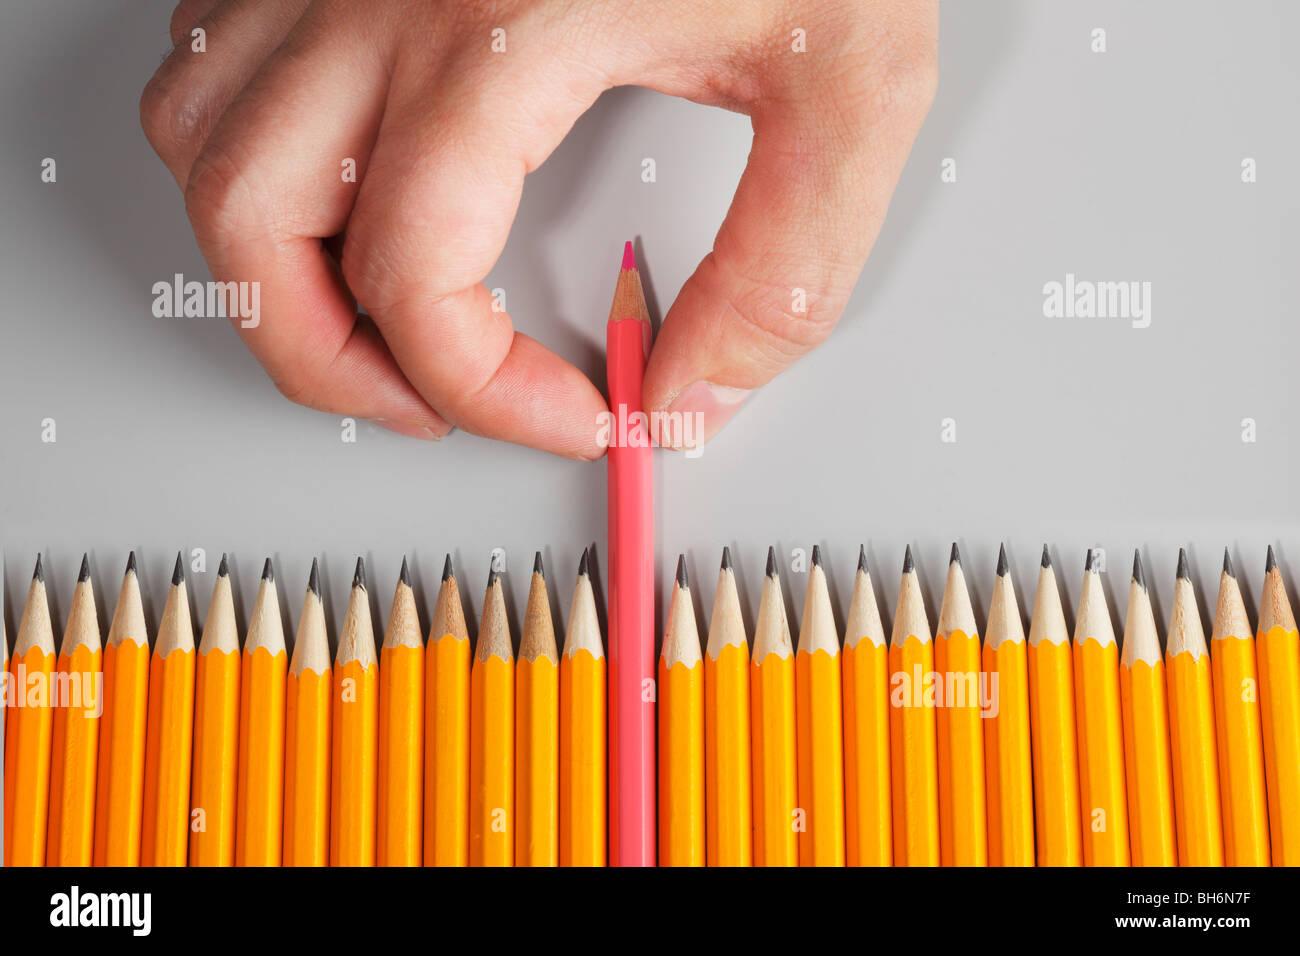 Elegir un color rosa lápiz a mano Imagen De Stock